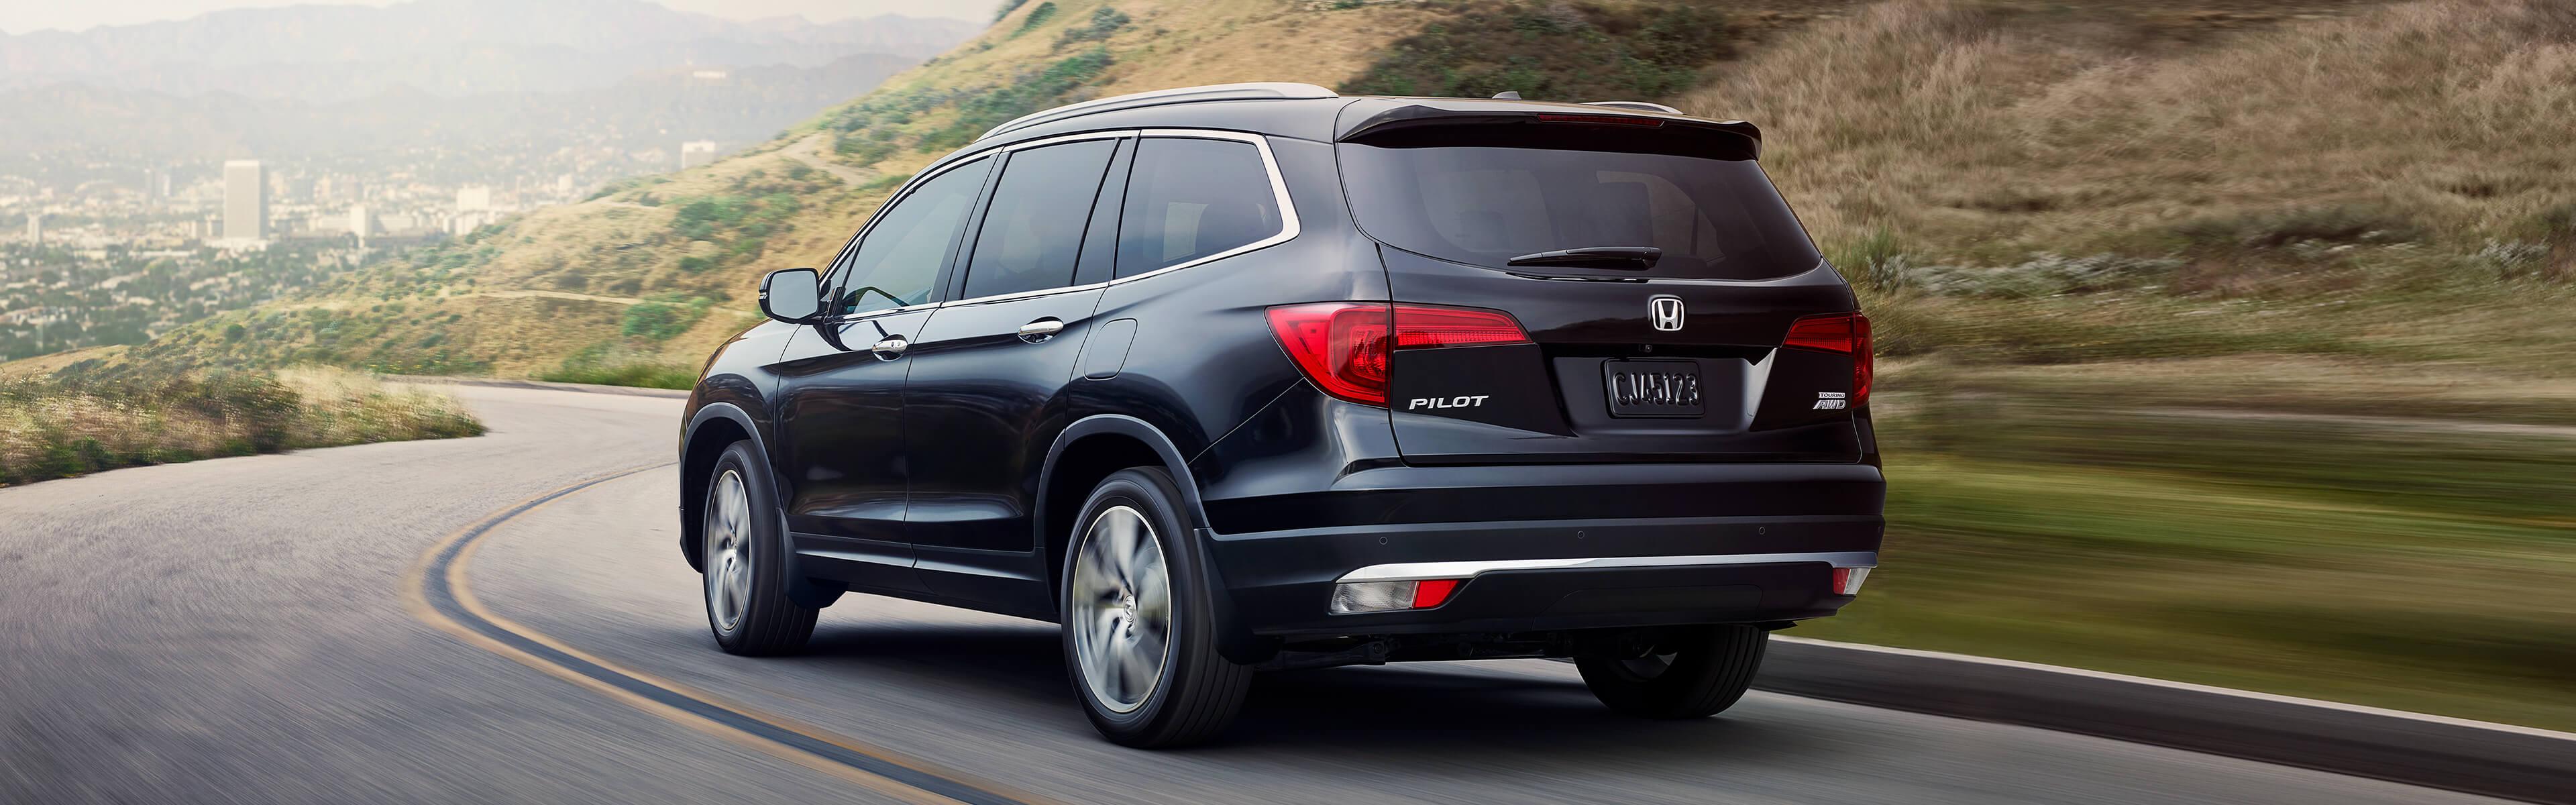 2019 Honda Pilot Redesign, Release And Price >> 2019 Honda Pilot Gillman Honda Houston Near Cypress Tx